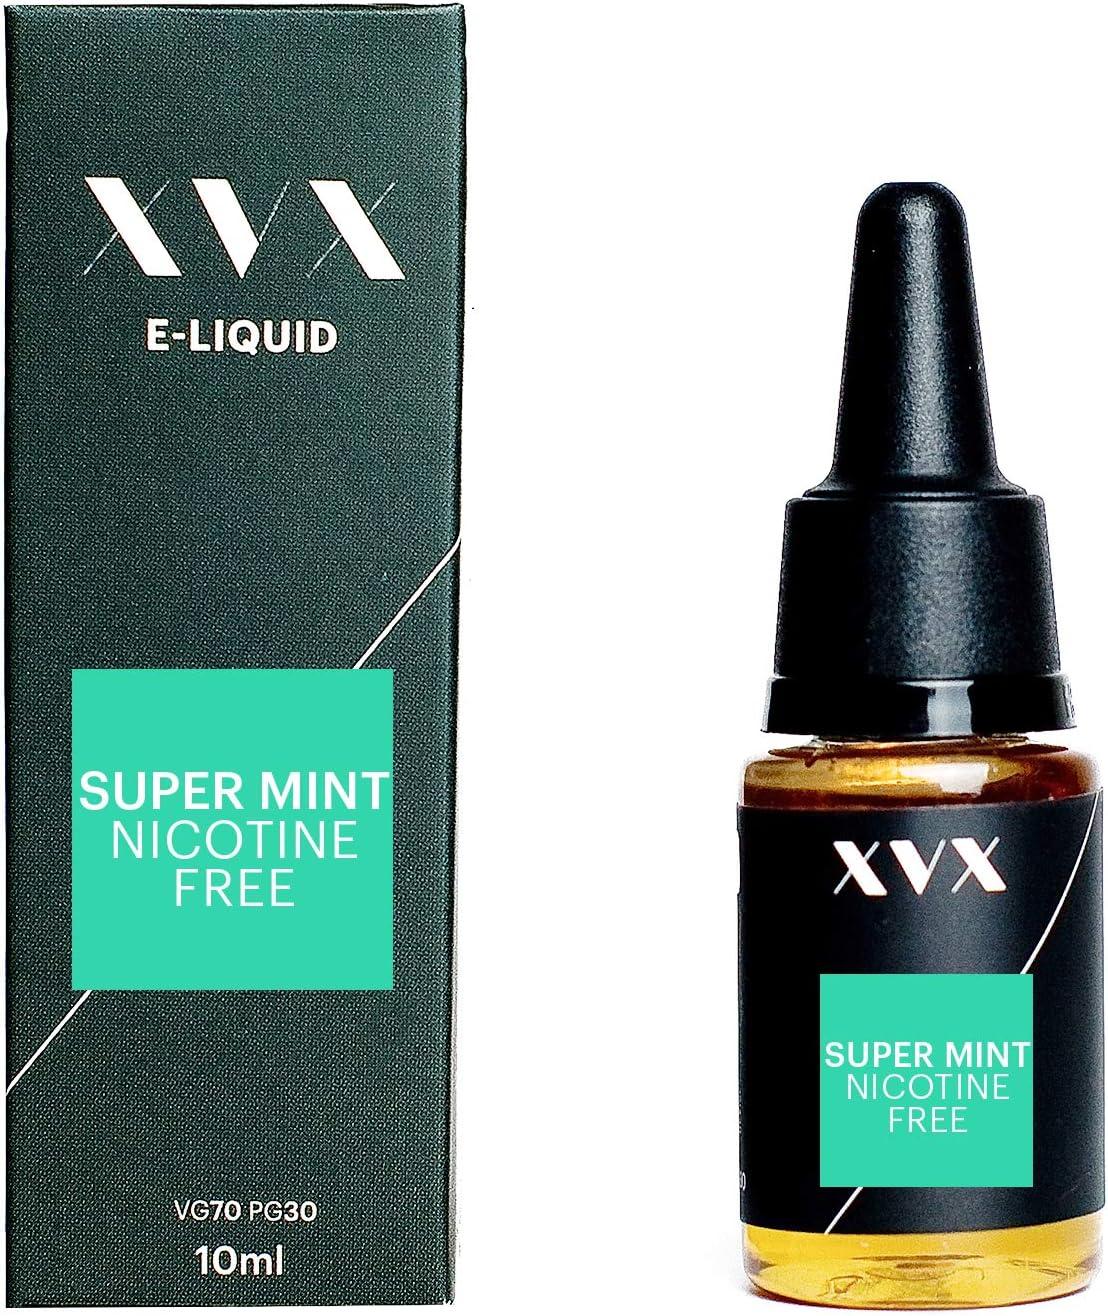 XVX E Liquid Super Mint Flavour Electronic Liquid For Vape Pen Cigarettes E Cigarette Shisha Vapouriser Liquid 10ml Nicotine Free Bottle Needle Tip Ecig E Cig